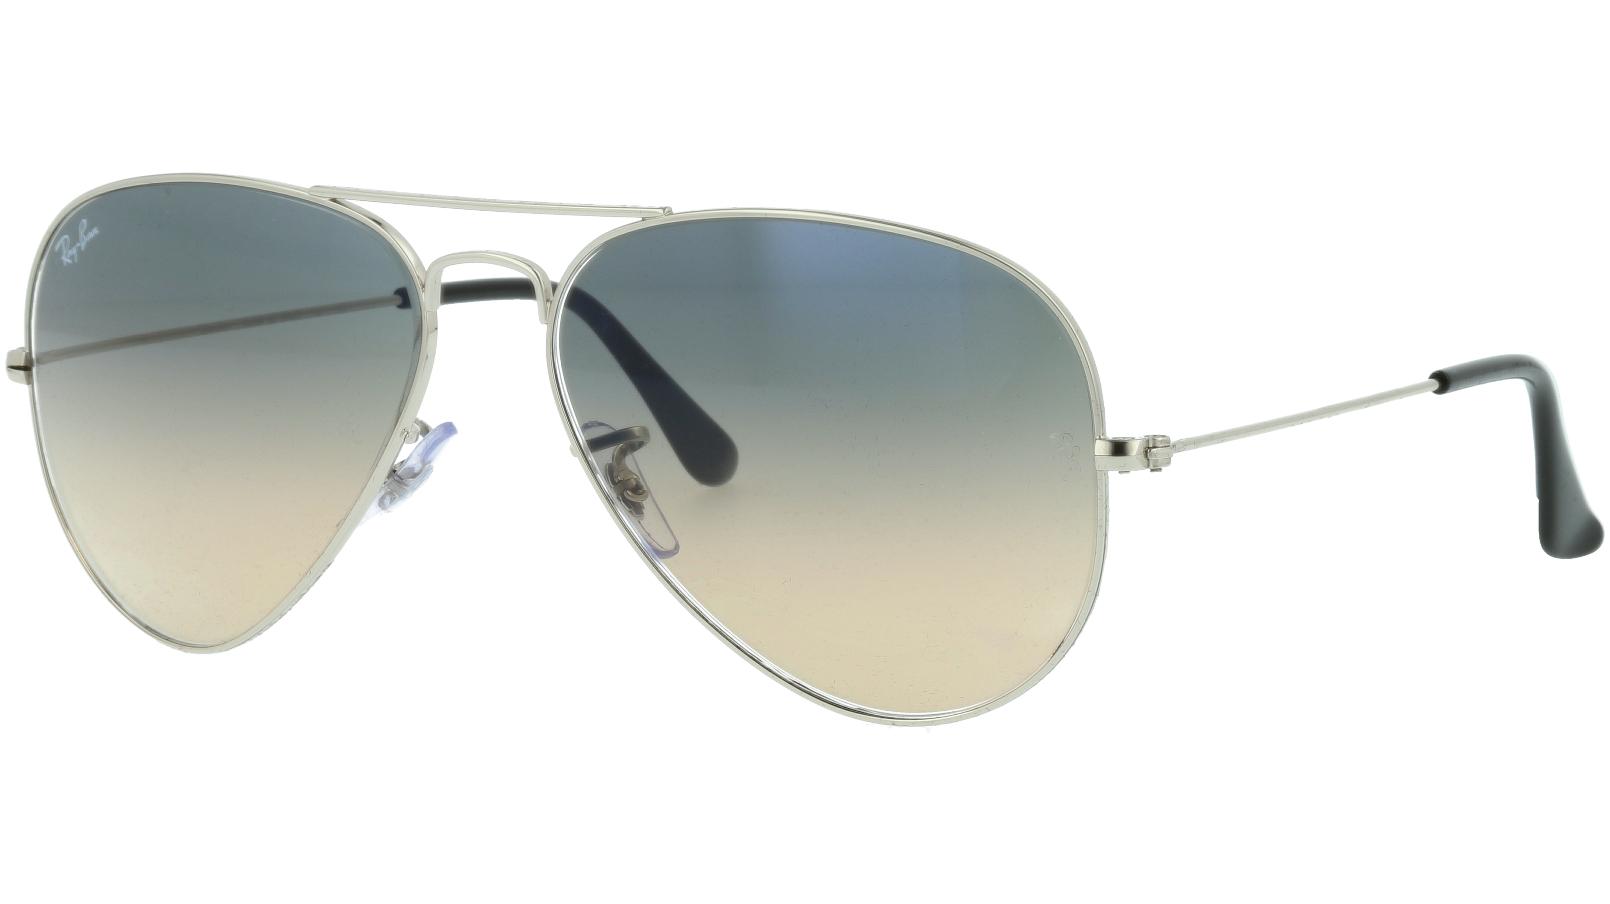 Ray-Ban RB3025 003/32 58 Silver Pilot Sunglasses